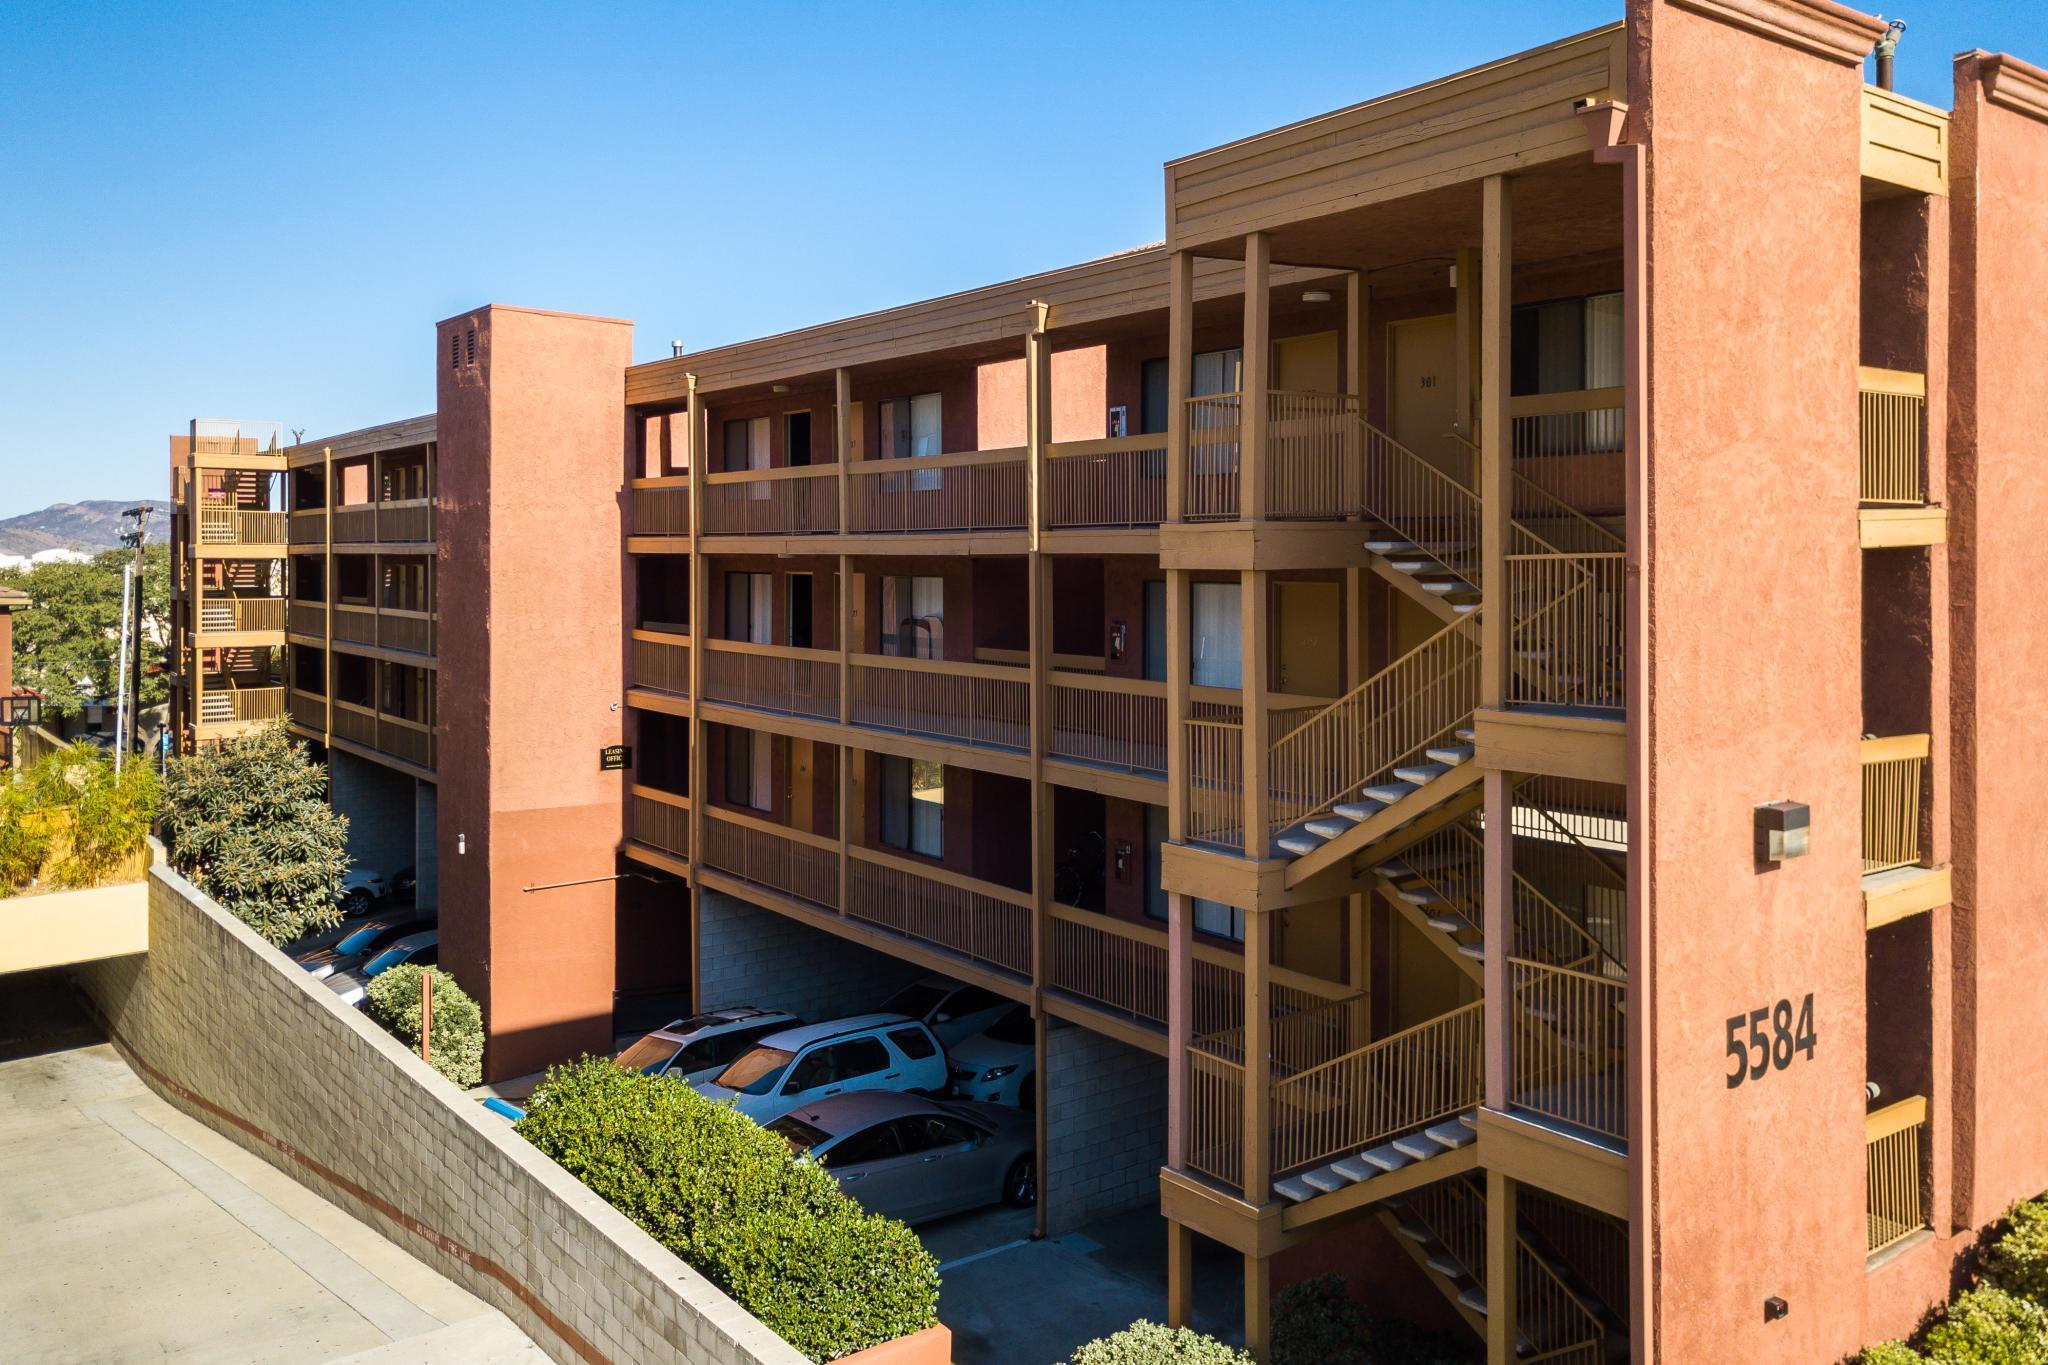 hardy avenue apartments rentals san diego ca trulia